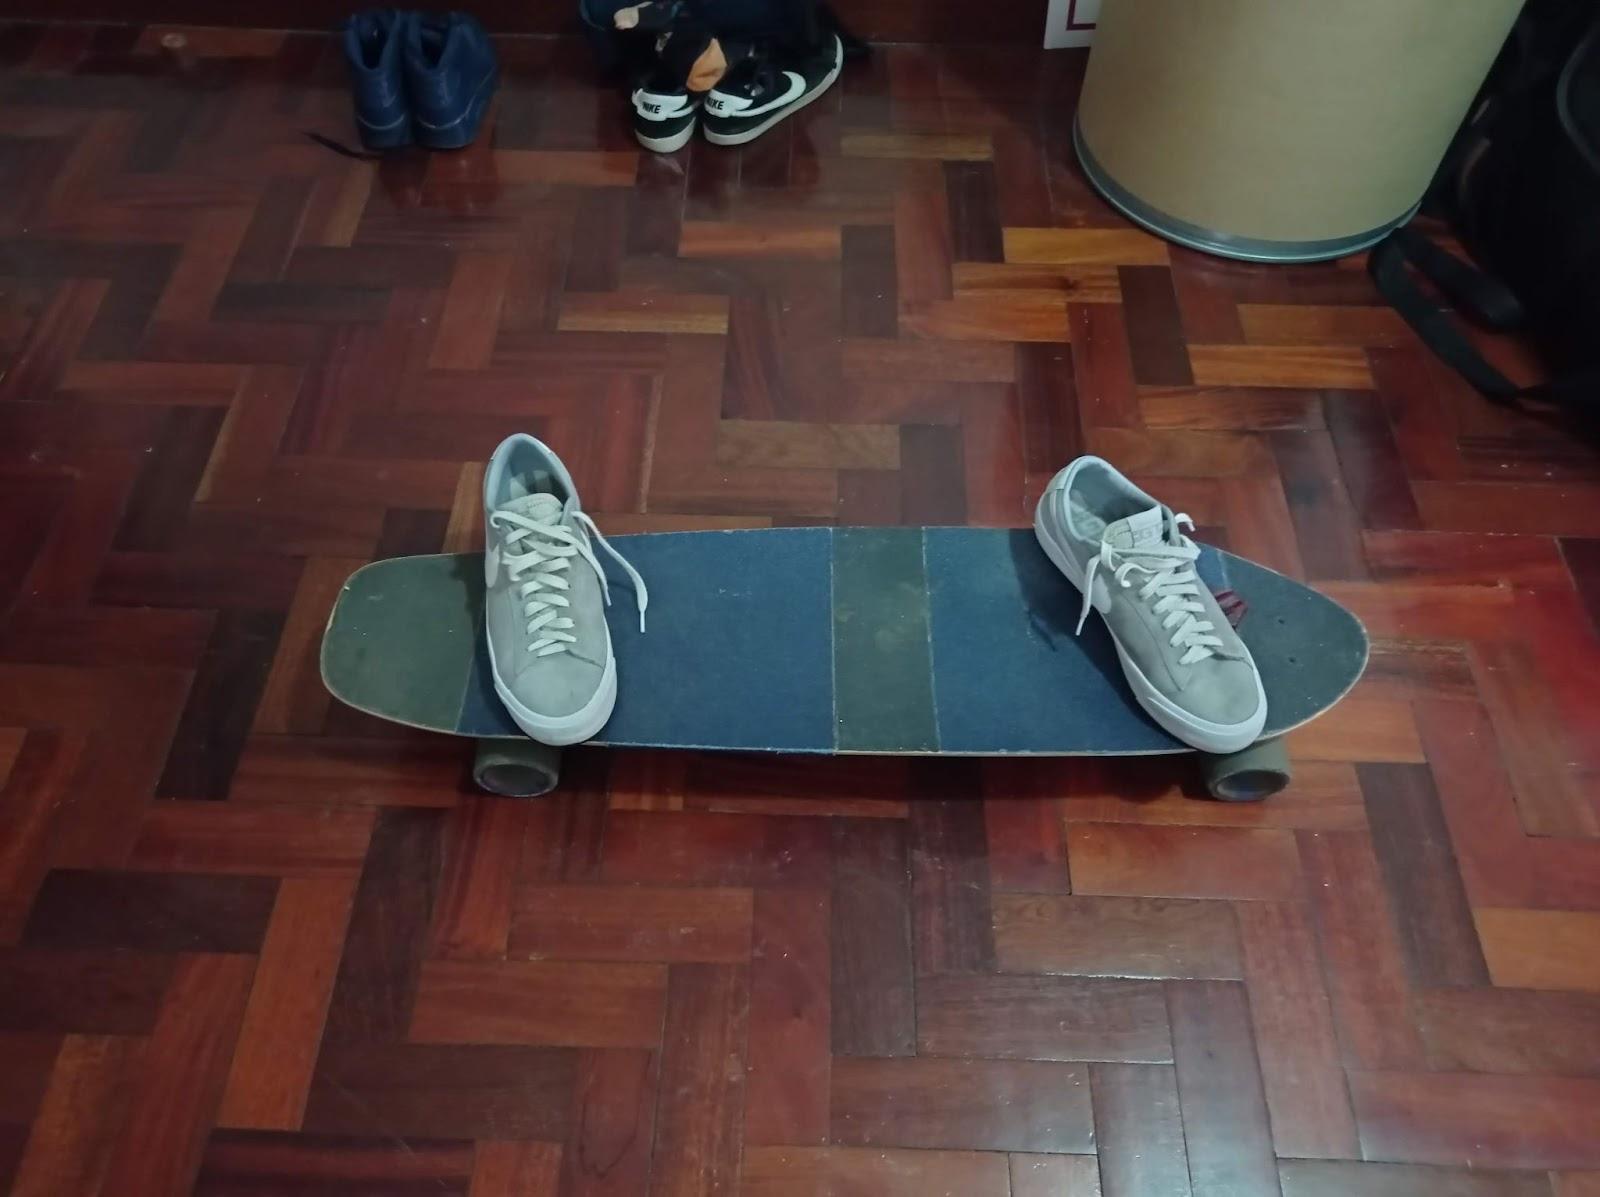 foot positioning for sliding longboarding